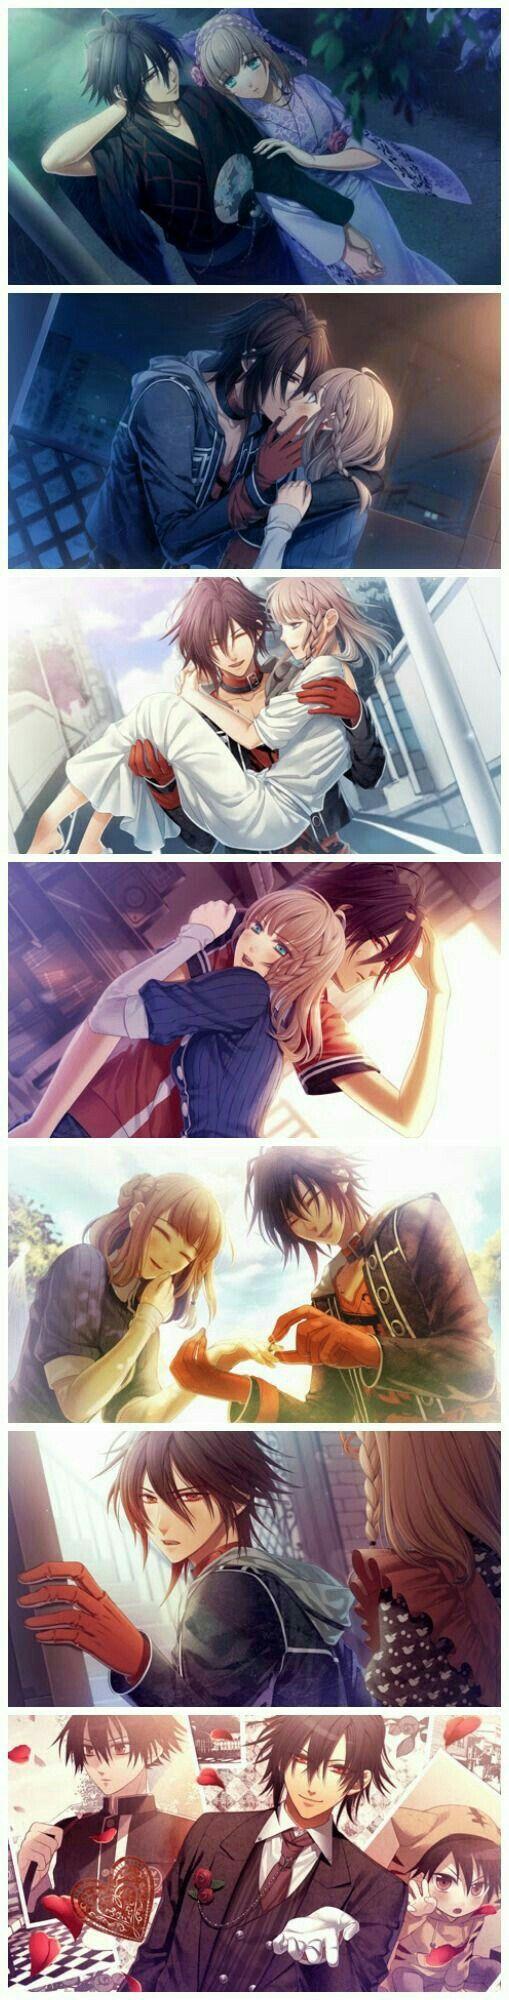 Heroine, Shin, Hugging, Smiling, Kissing, Laughing, pictures, cute; Amnesia Memories